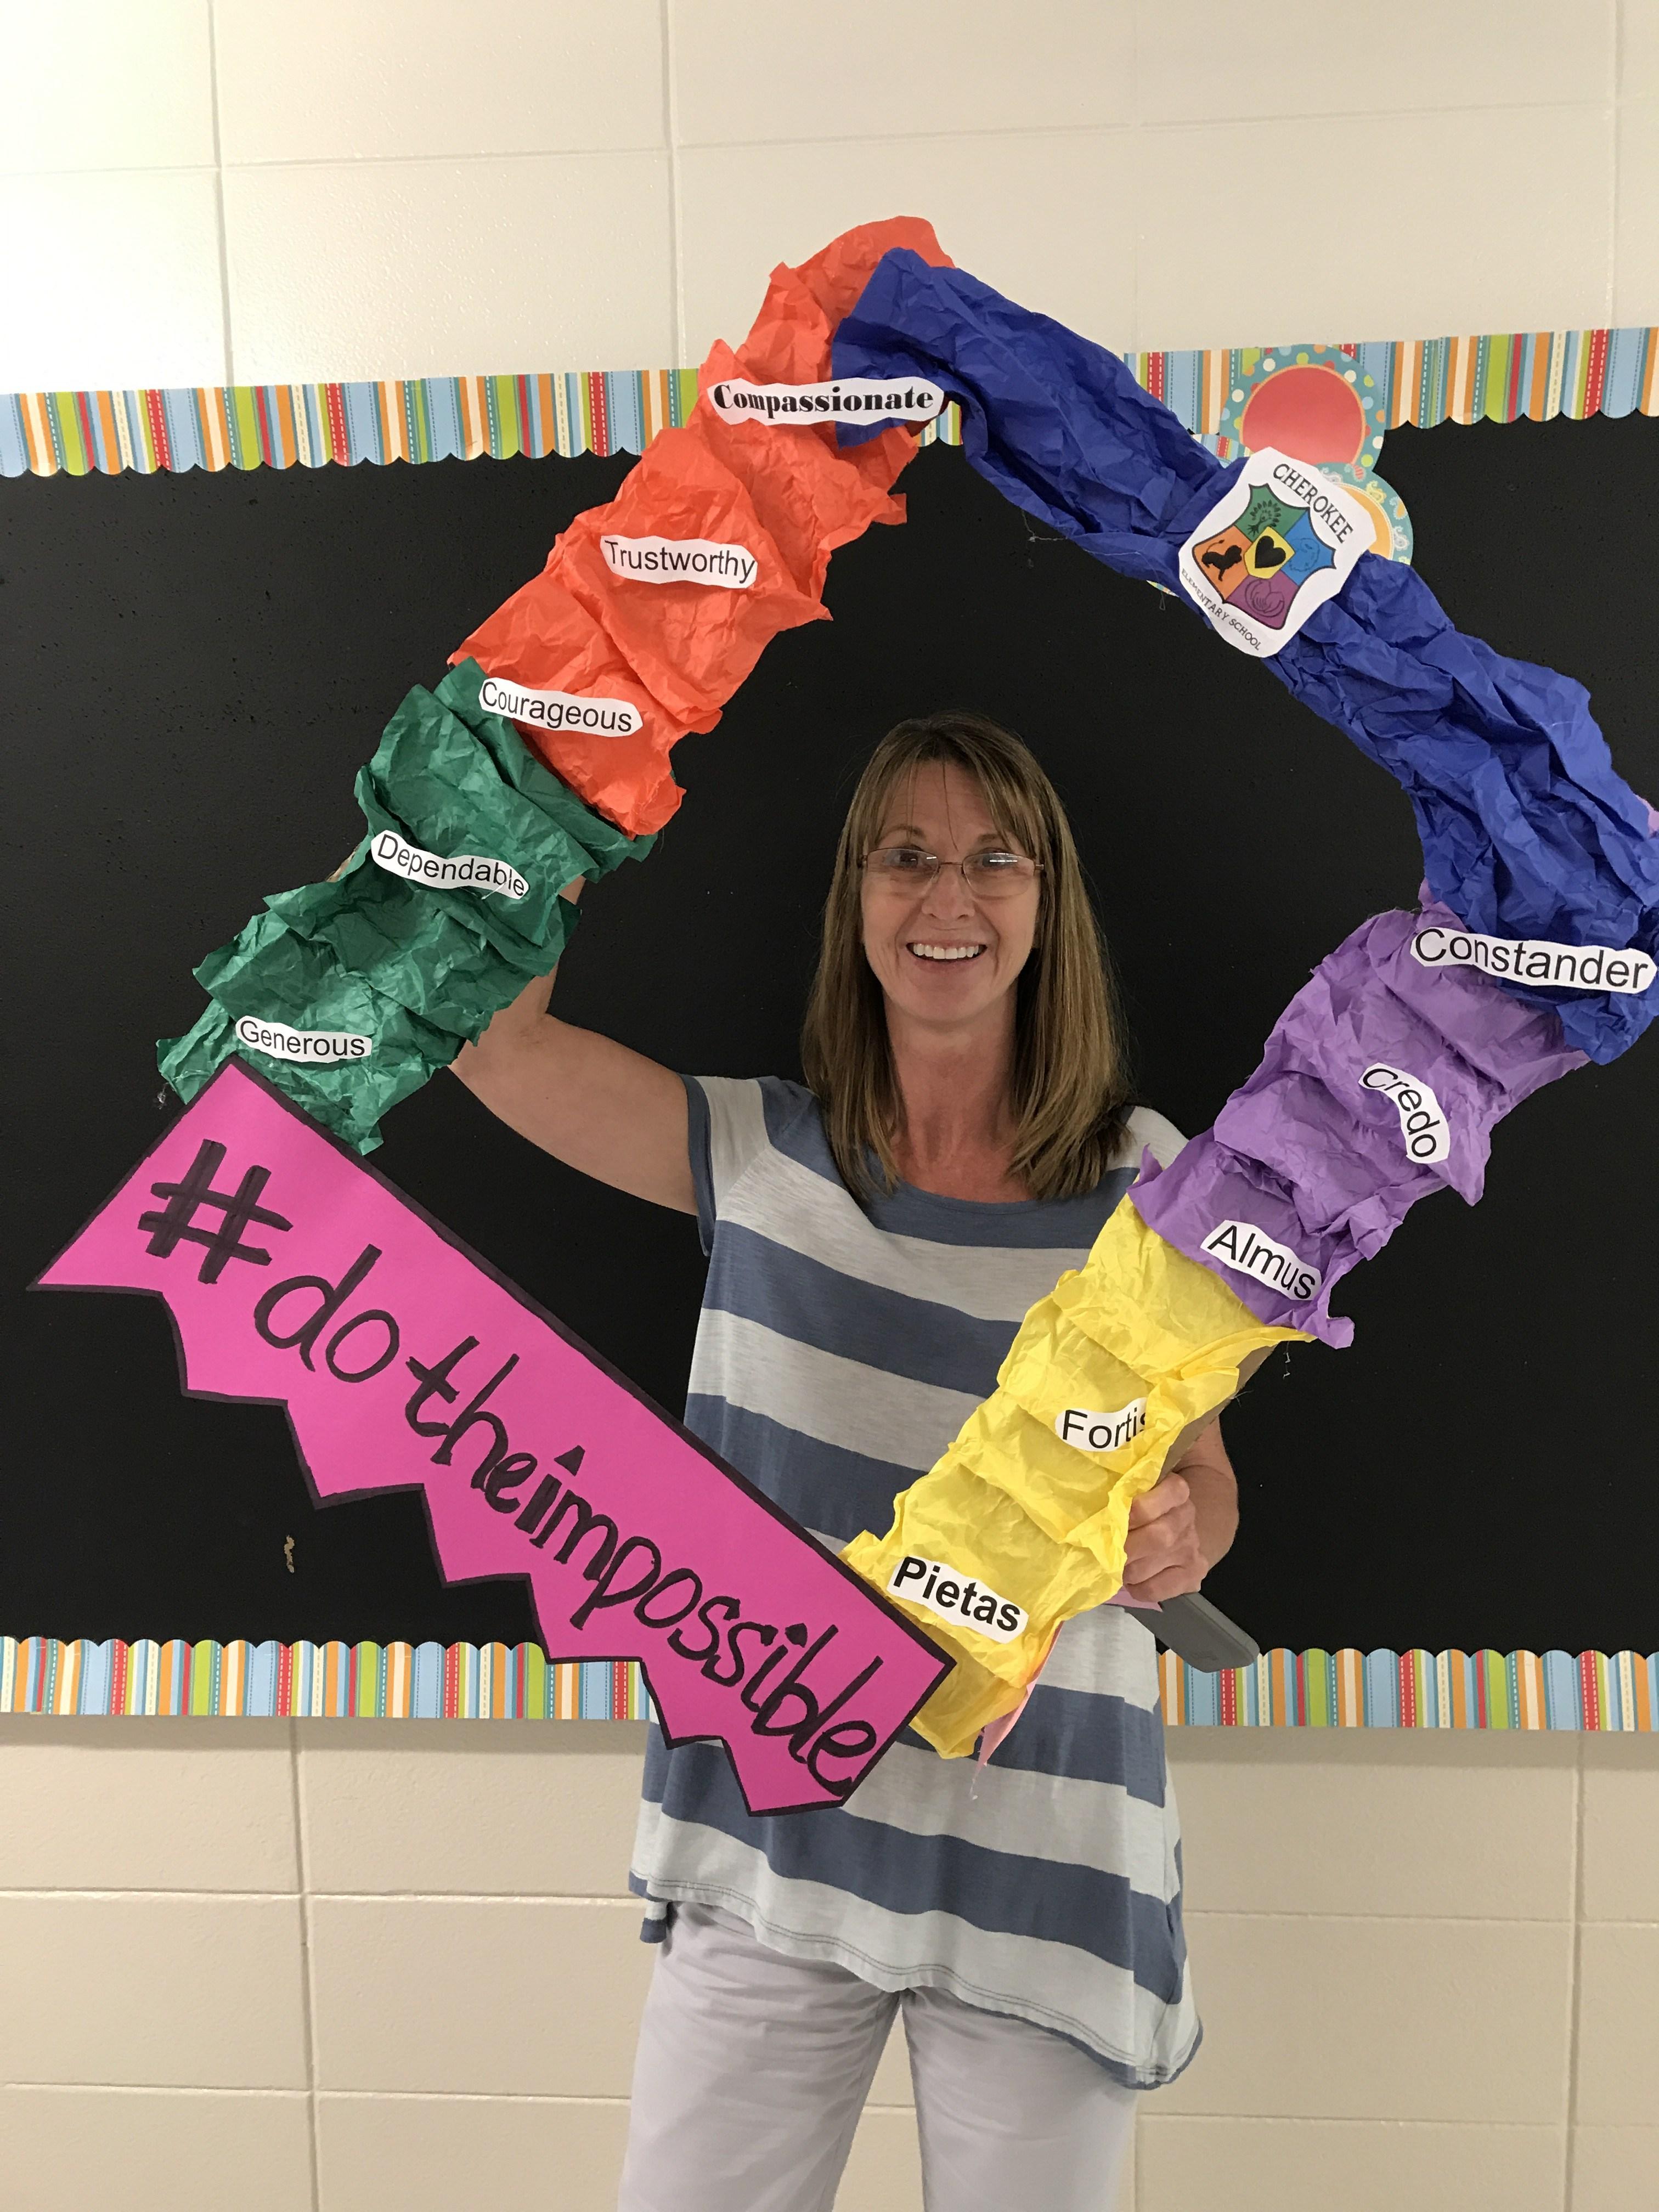 Ms. Bankston, principal